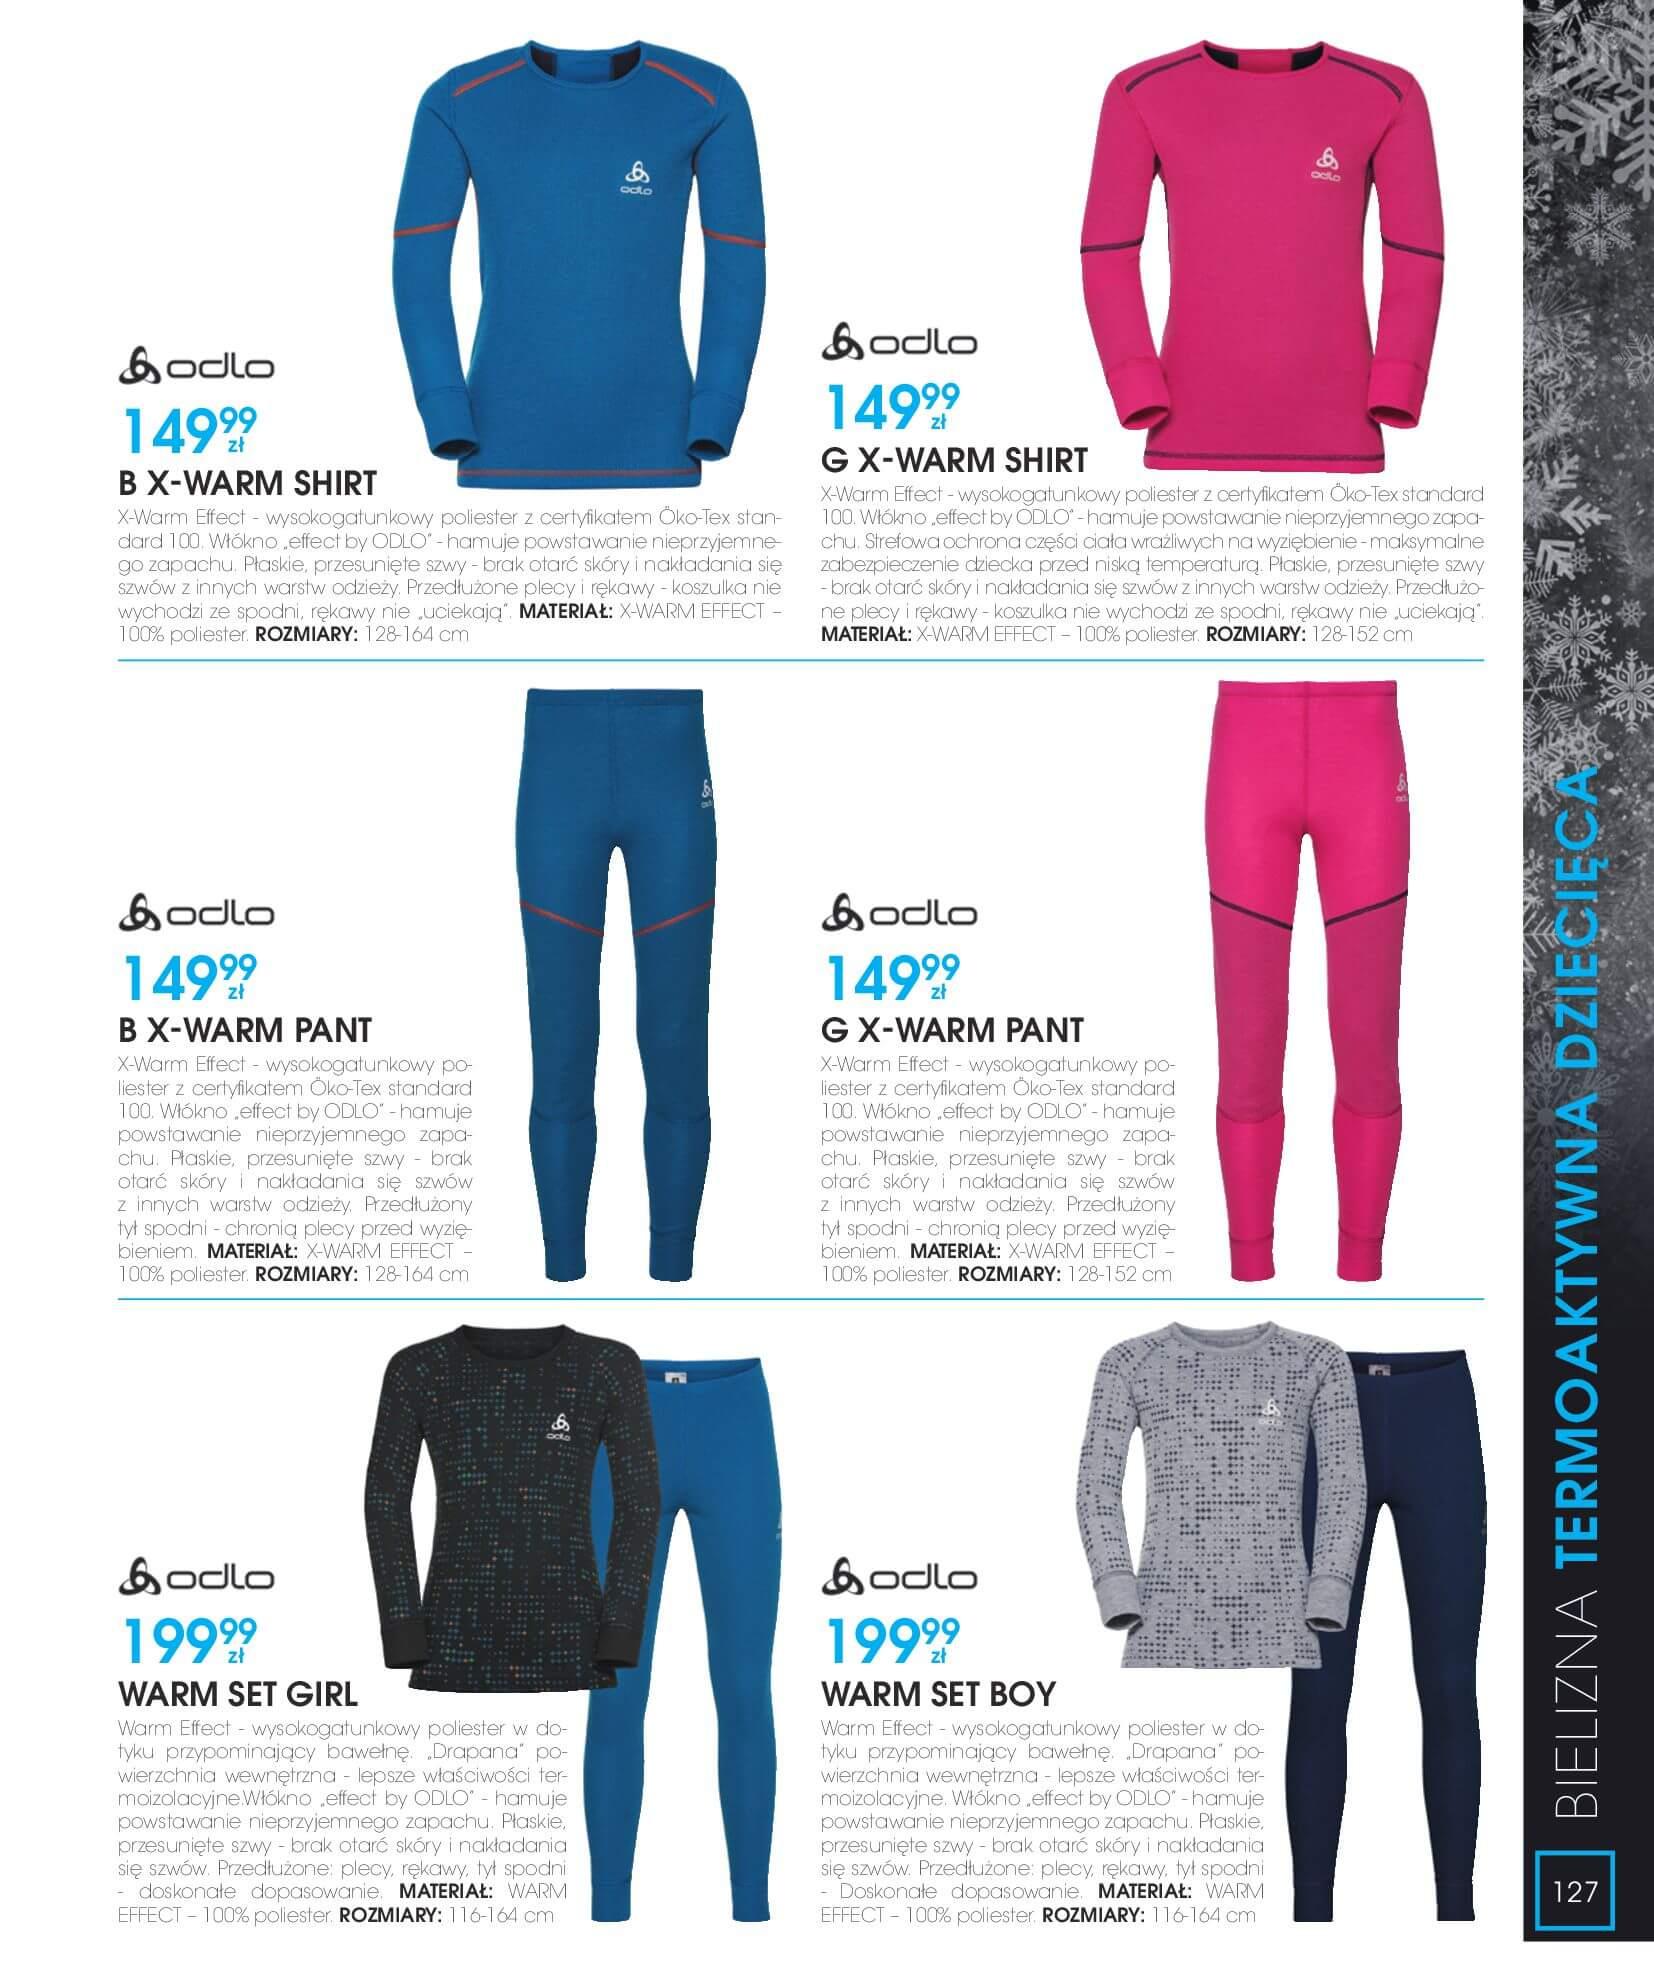 Gazetka Go Sport - Katalog Zima 2017/2018-12.11.2017-28.02.2018-page-127